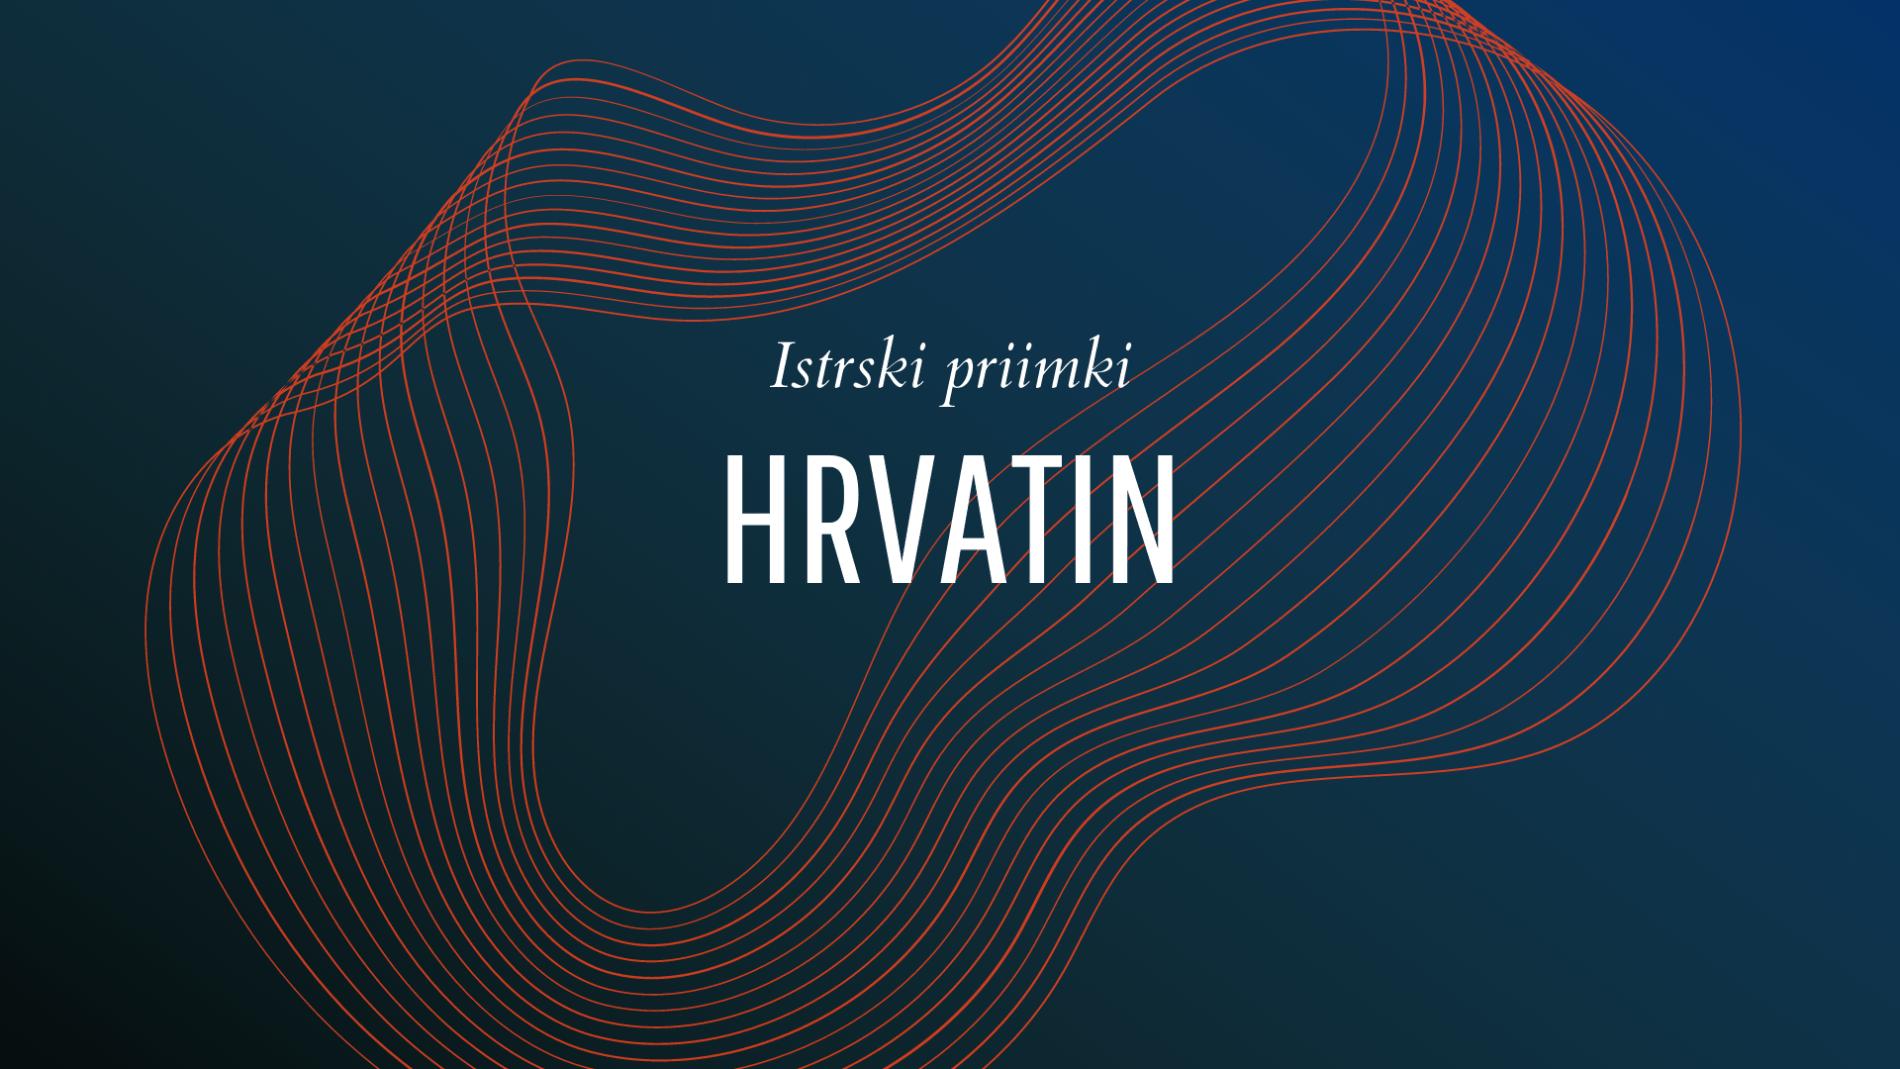 Istrski priimki: Hrvatin